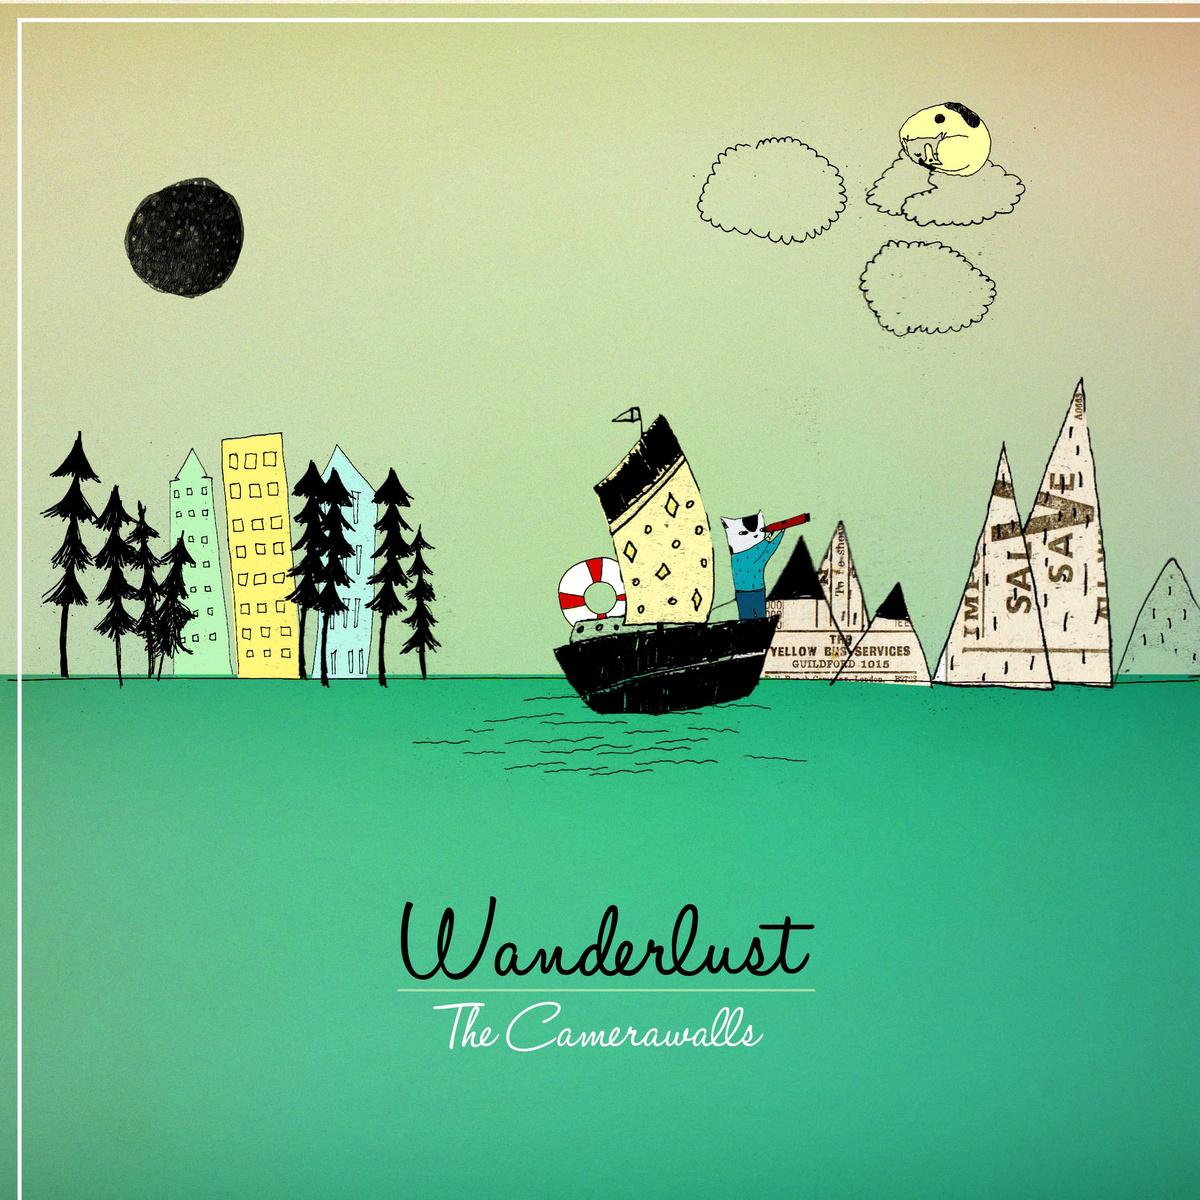 Wanderlust - The Camerawalls (Single) - LILYSTARS RECORDS